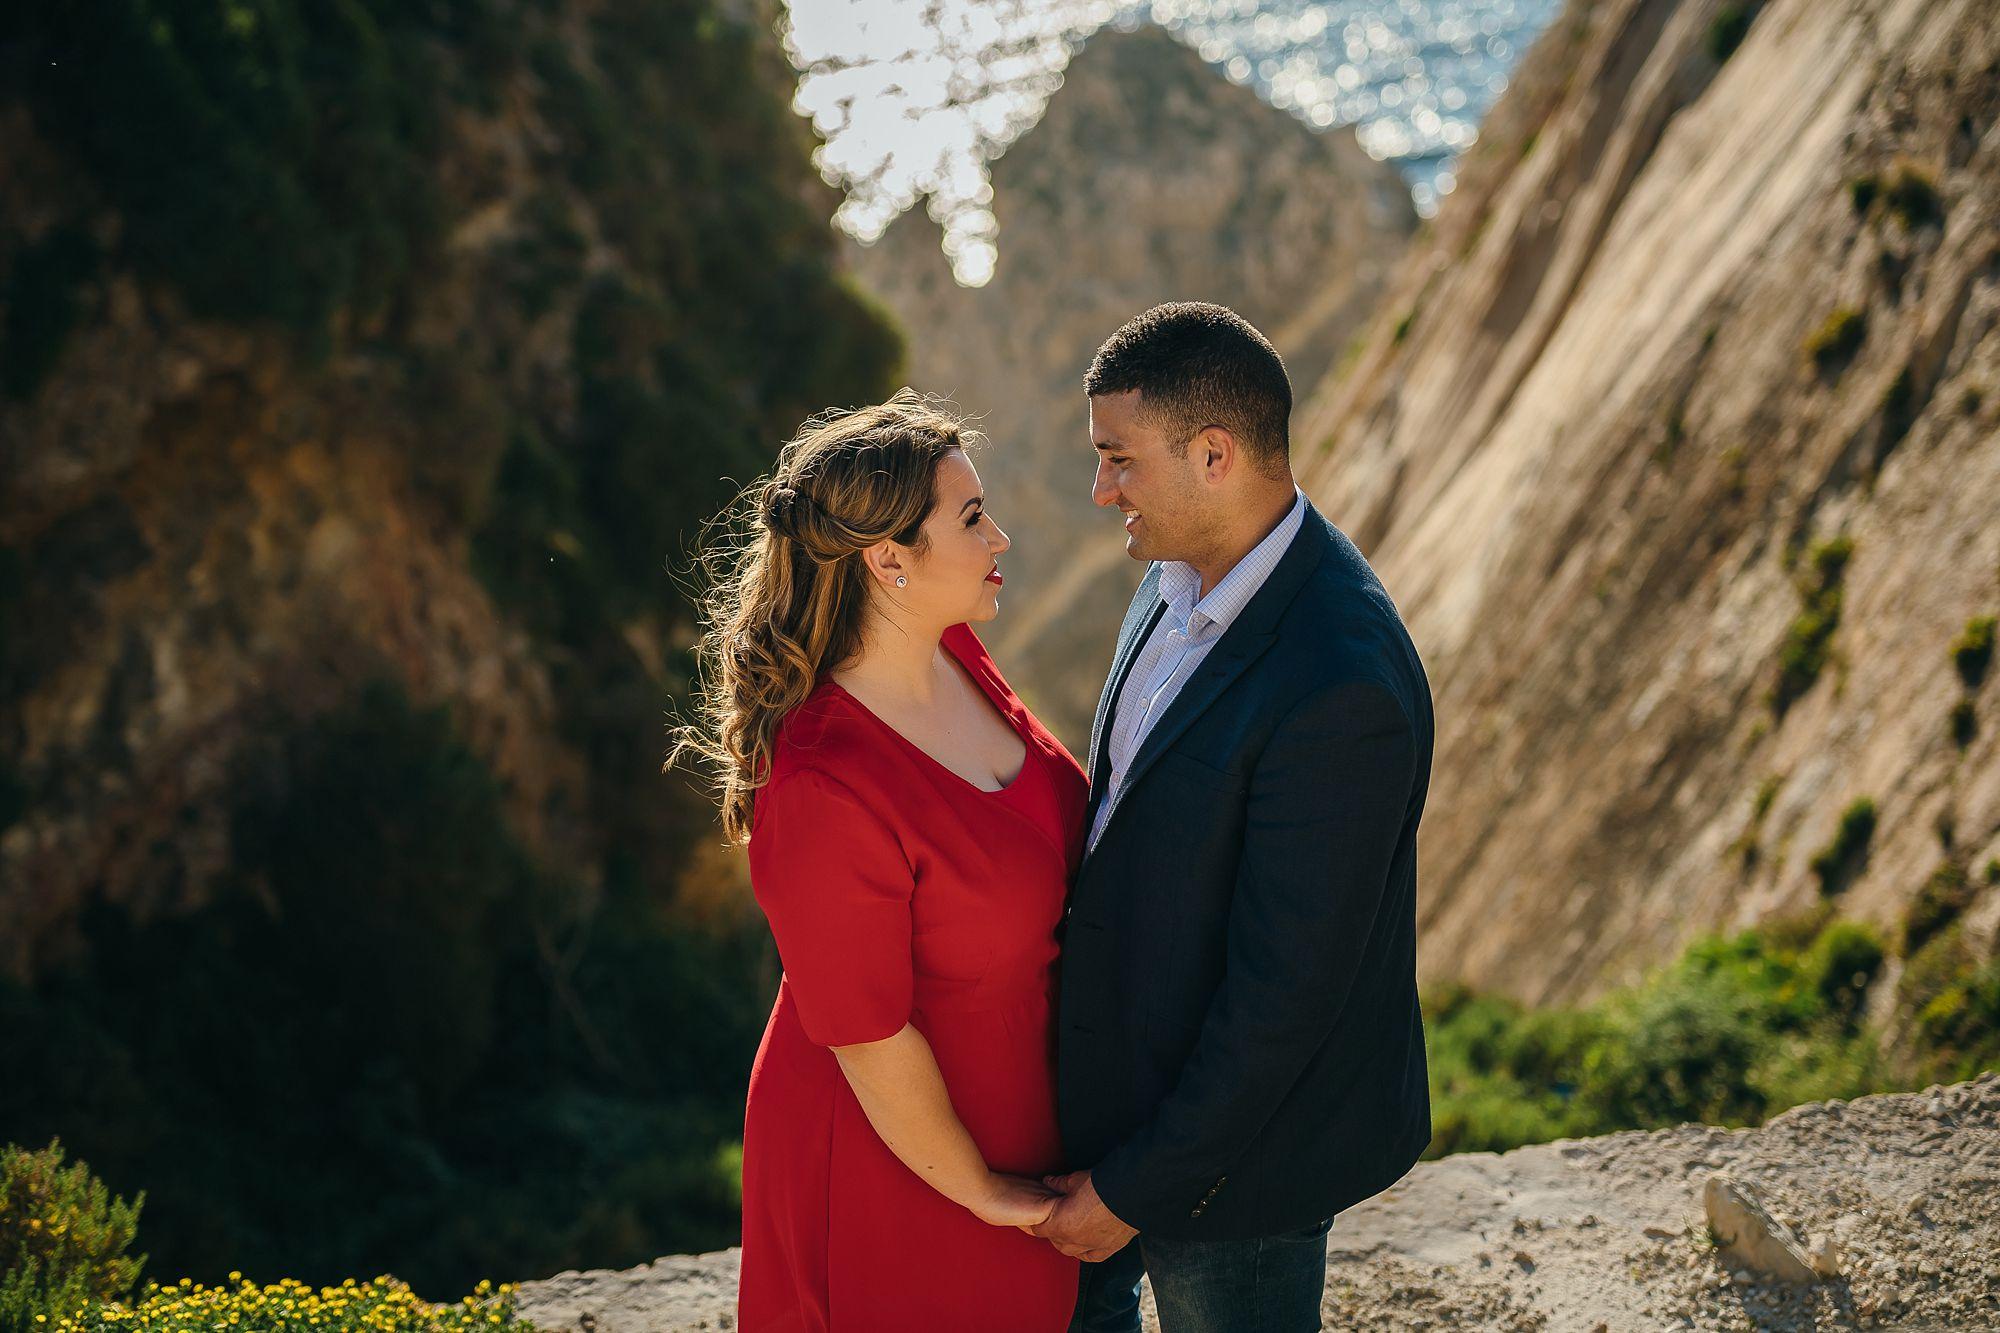 Josielle & Nolan | Pre-Wedding | Malta | Shane P. Watts Photography